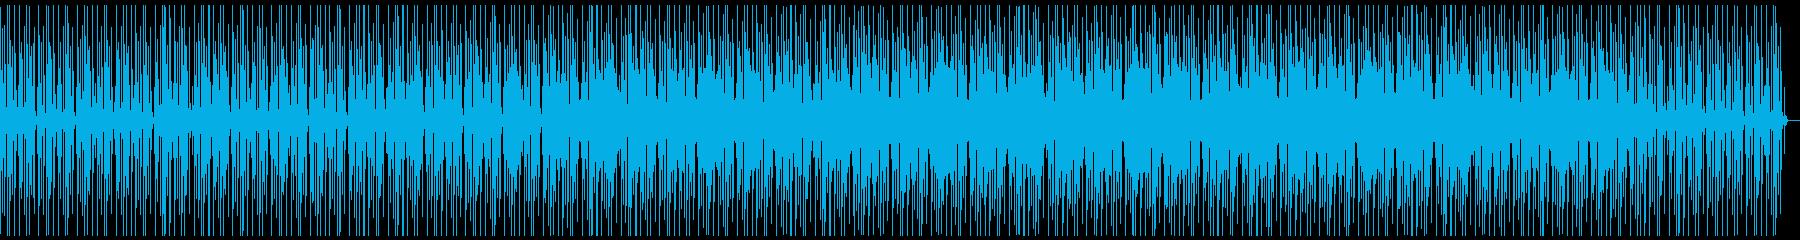 528Hz日常のストレス解放の瞑想曲1の再生済みの波形